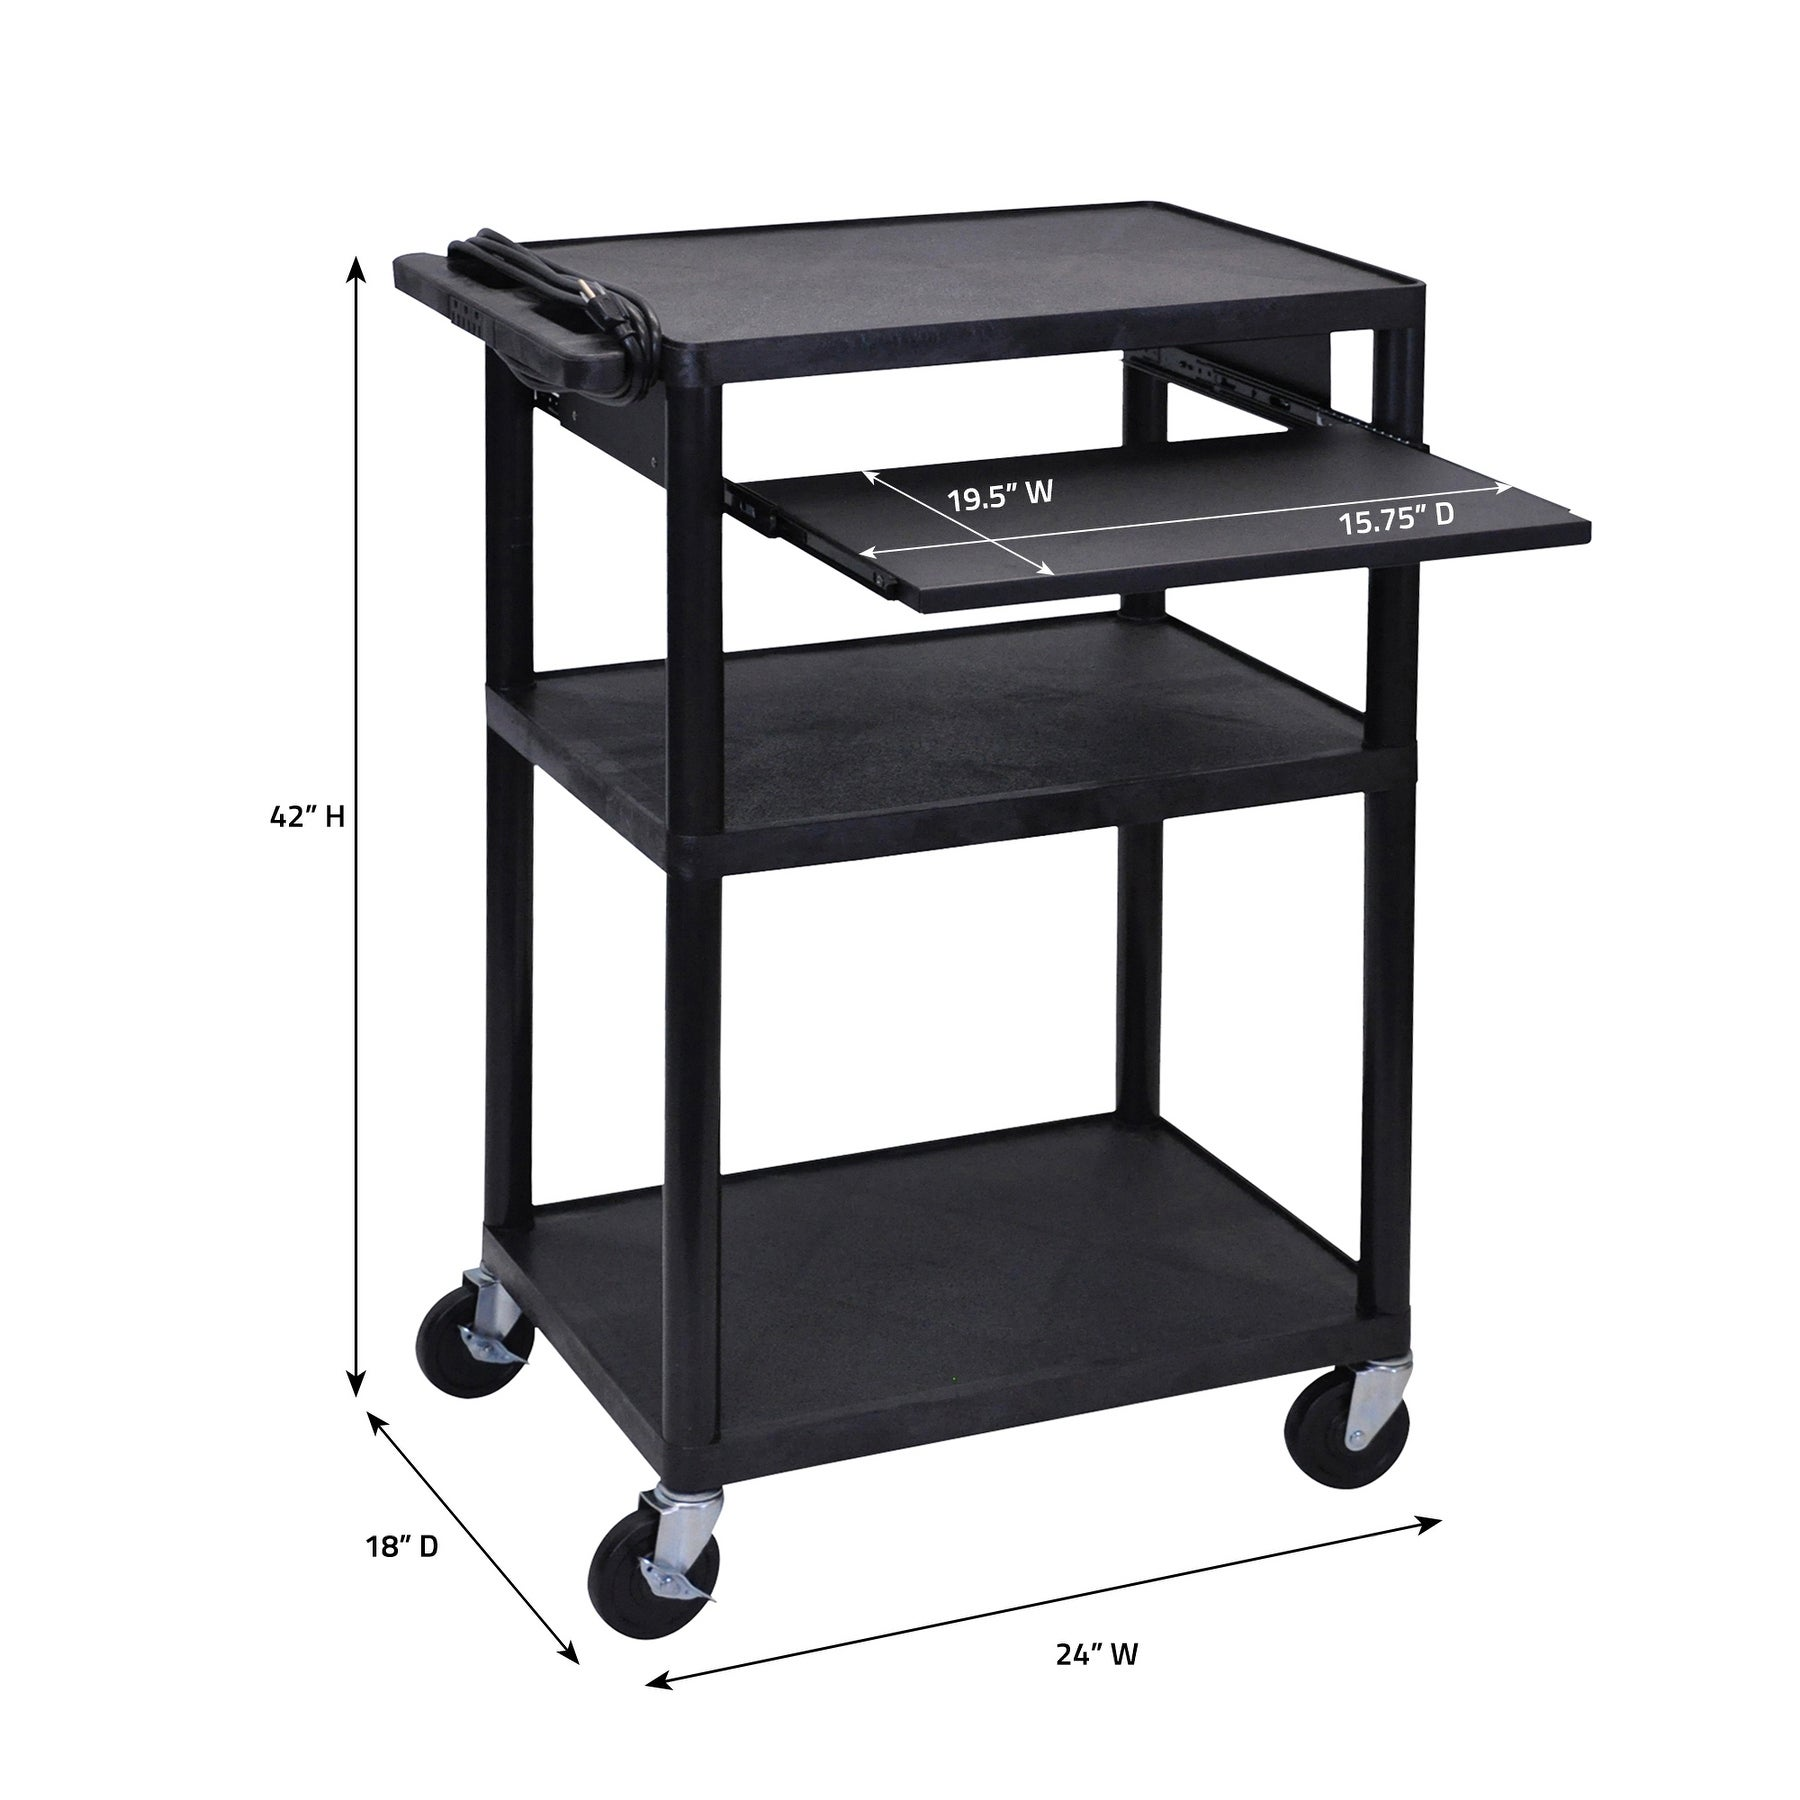 Offex Of Lp42le B Endura Black 3 Shelves Heavy Duty Av Utility Cart With Pull Out Shelf Overstock 7607521